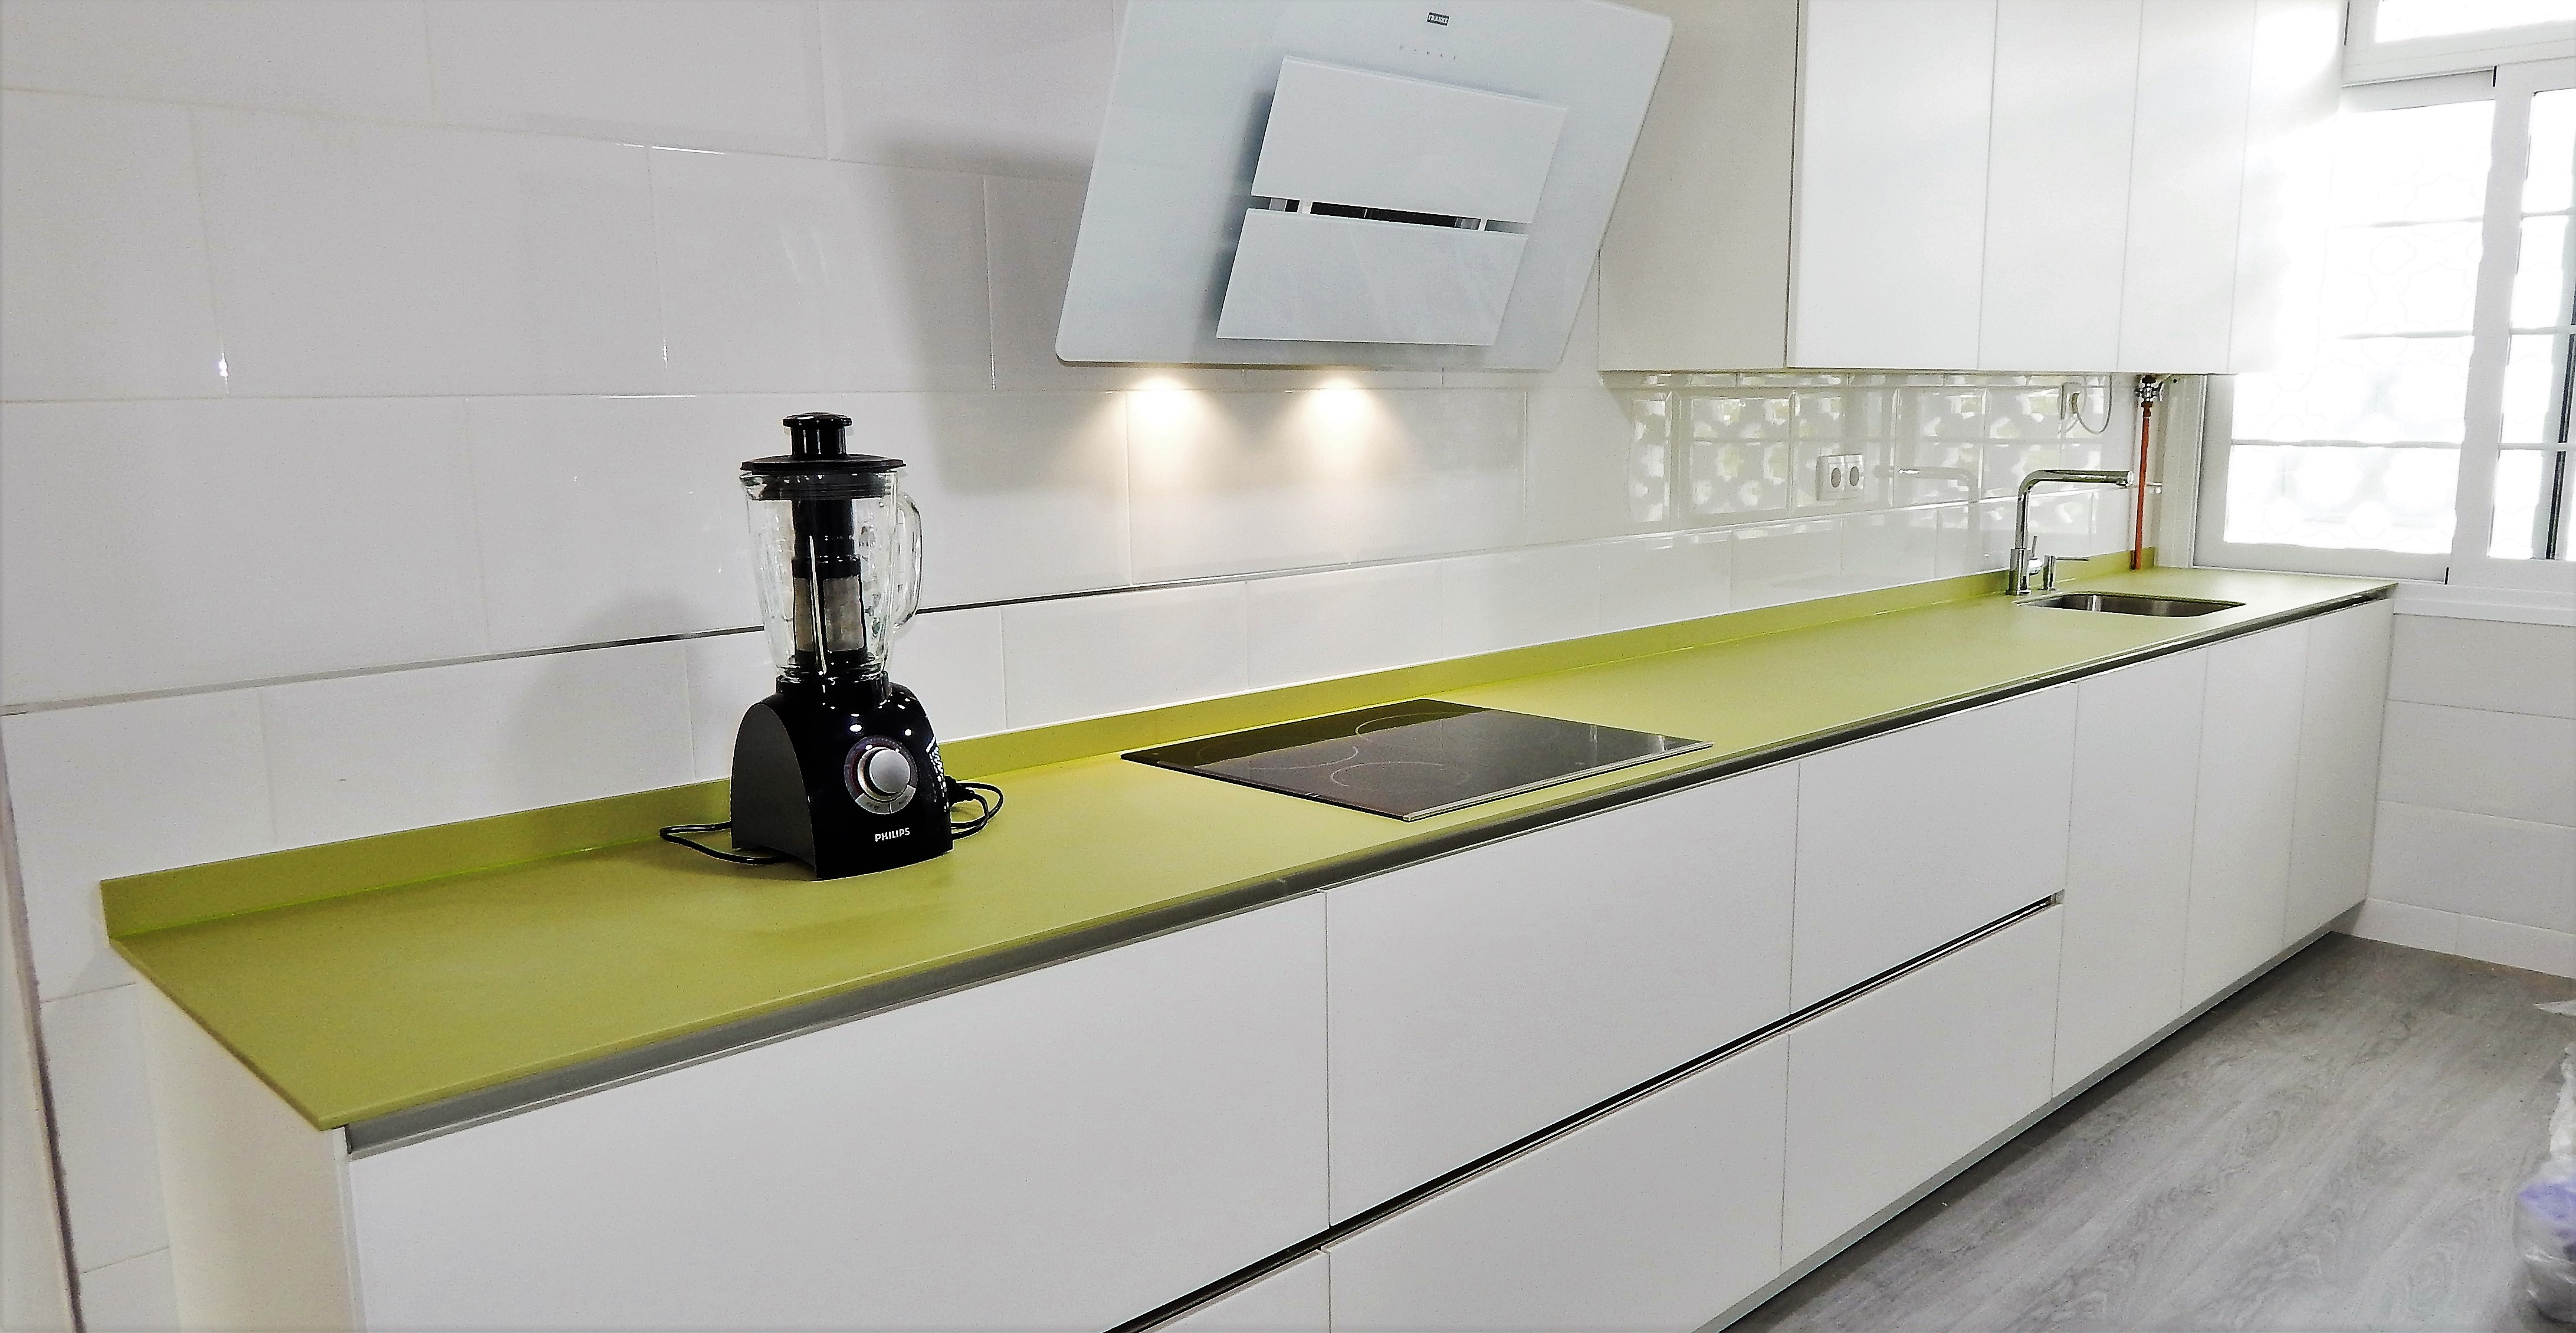 Muebles de cocina cristal mate blanco for Muebles cocina on line